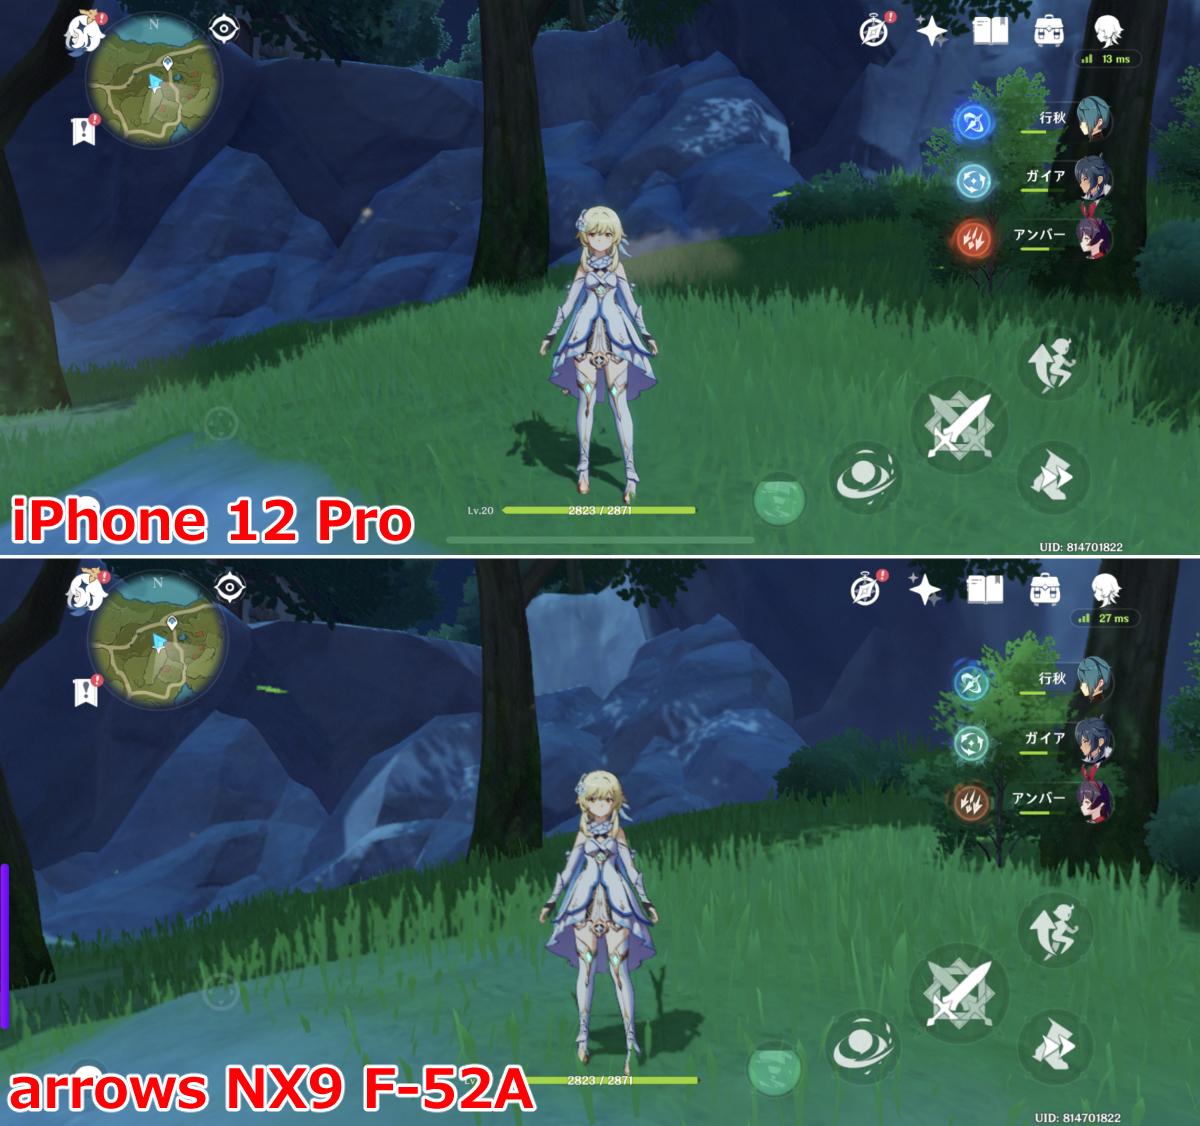 arrows NX9 F-52AとiPhone 12 Proのゲーム画像